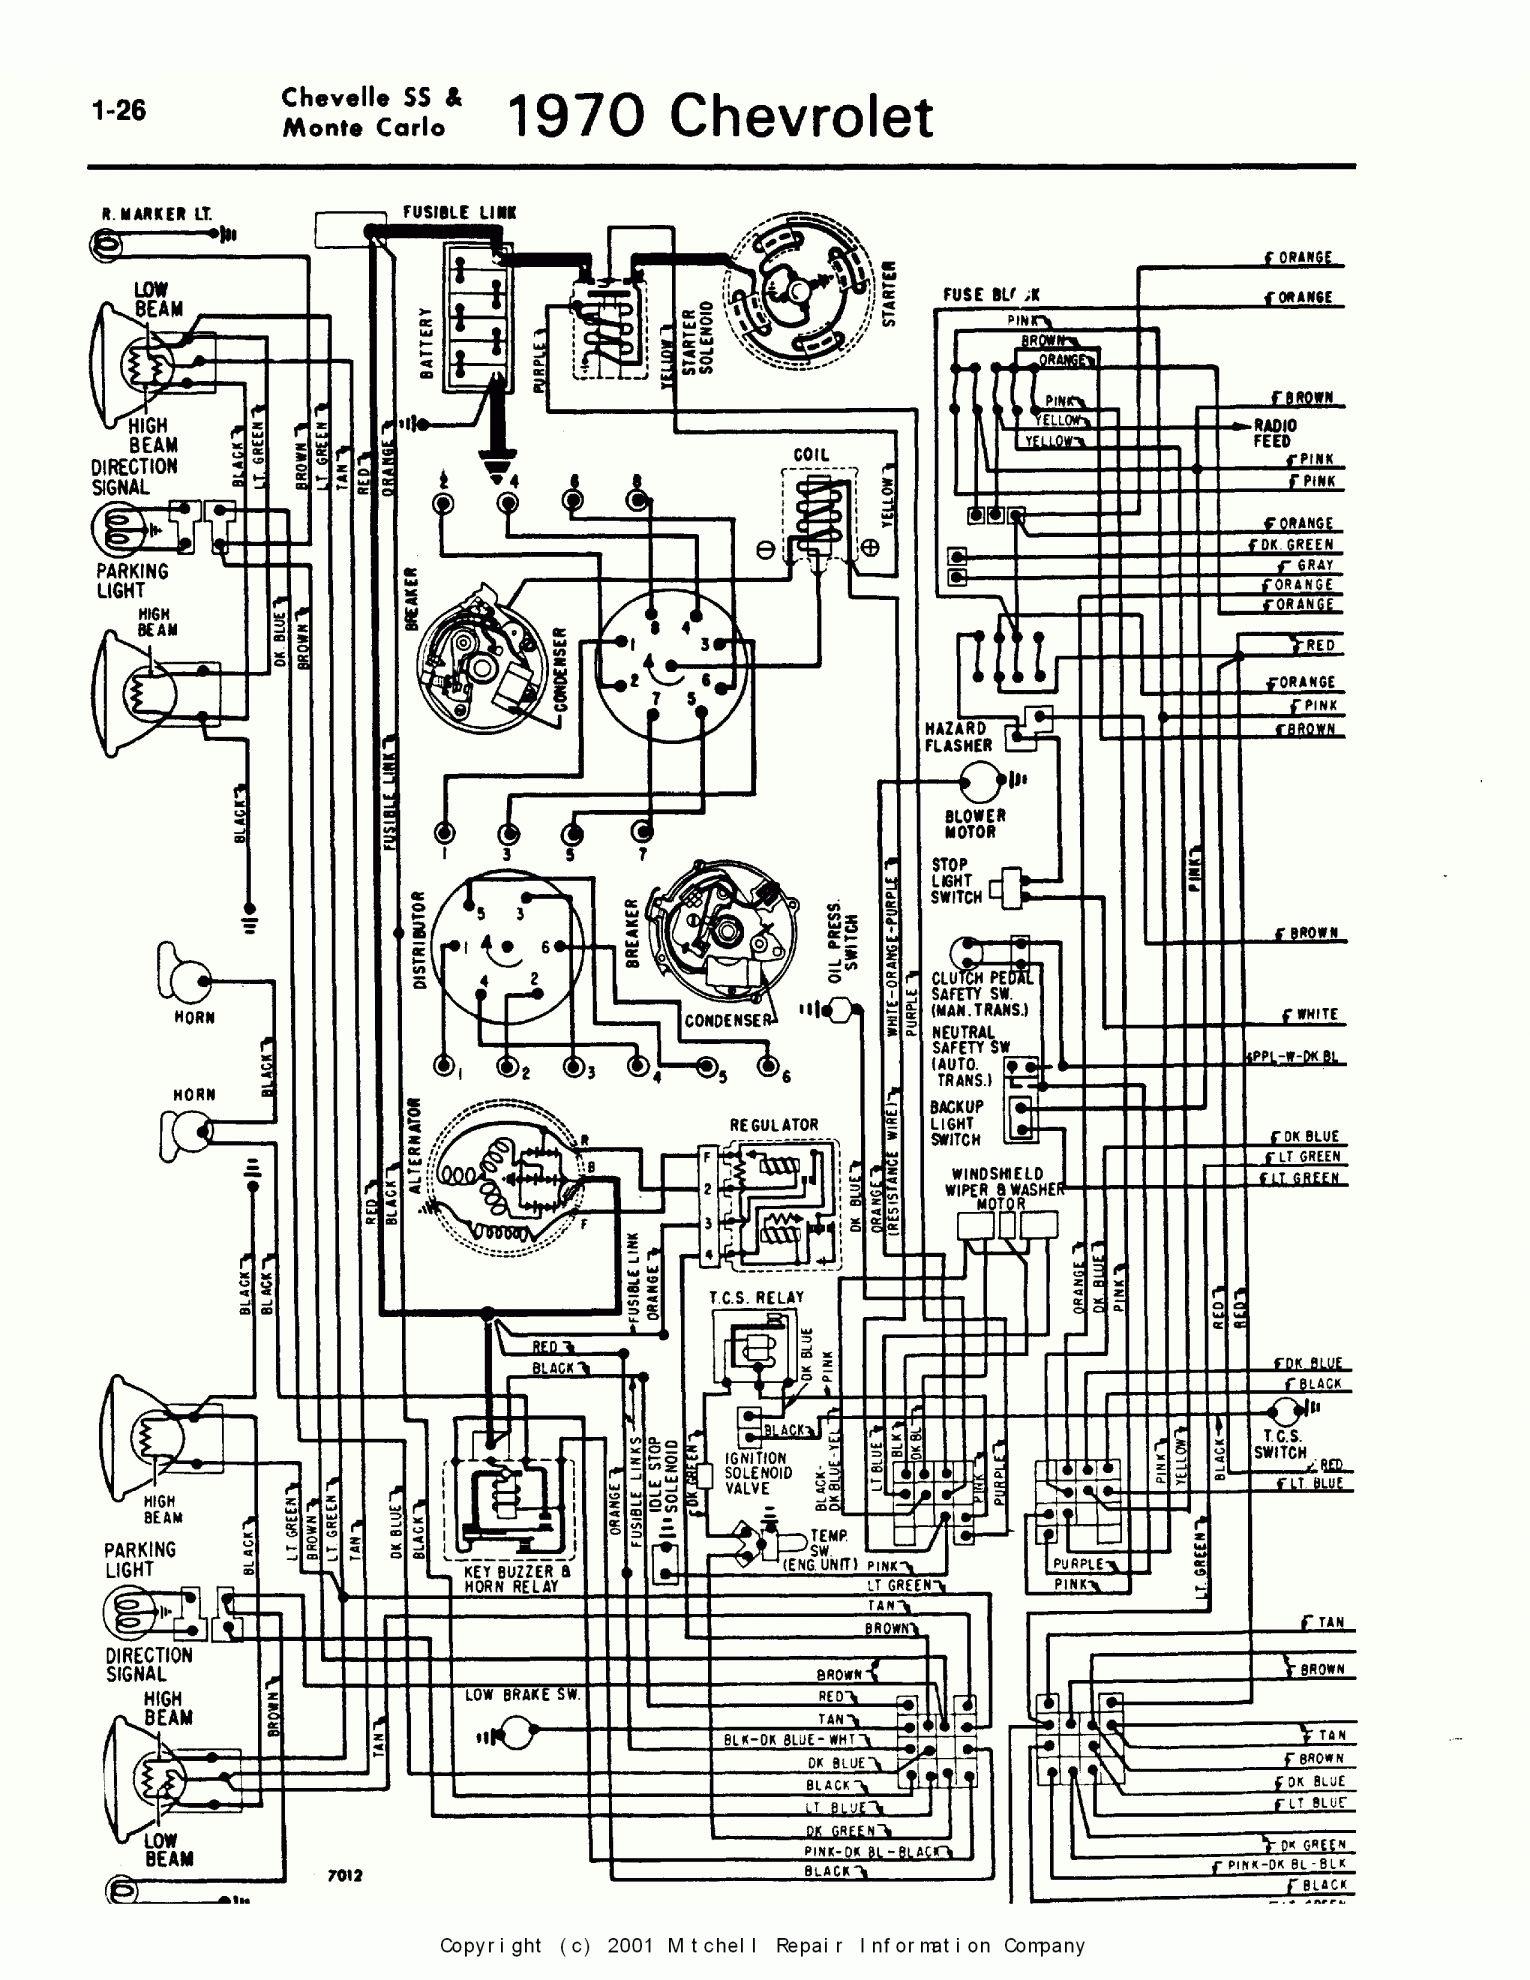 Engine Diagram Wiringg Net In 2020 1970 Chevelle Chevelle 1967 Chevelle